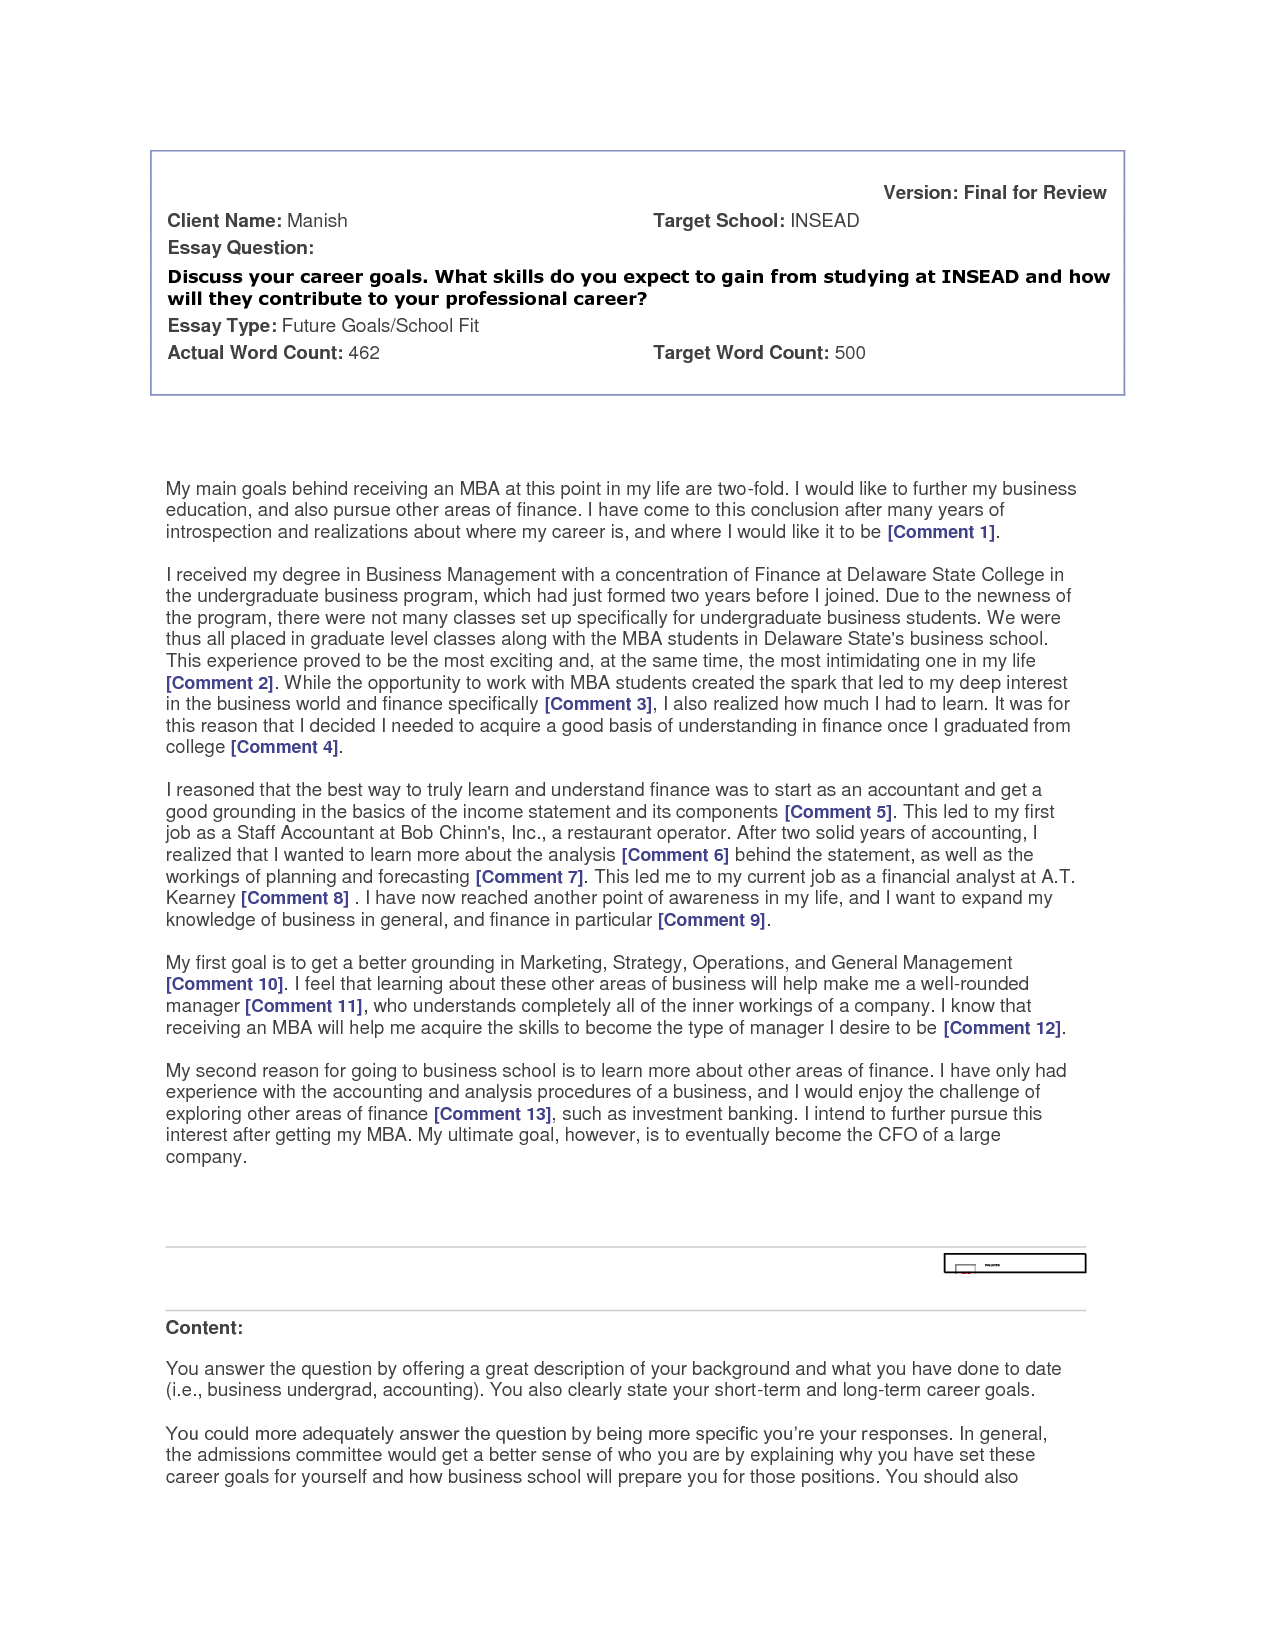 005 Essay Example Career Goals Examples Imposing Scholarship Pdf Educational Full